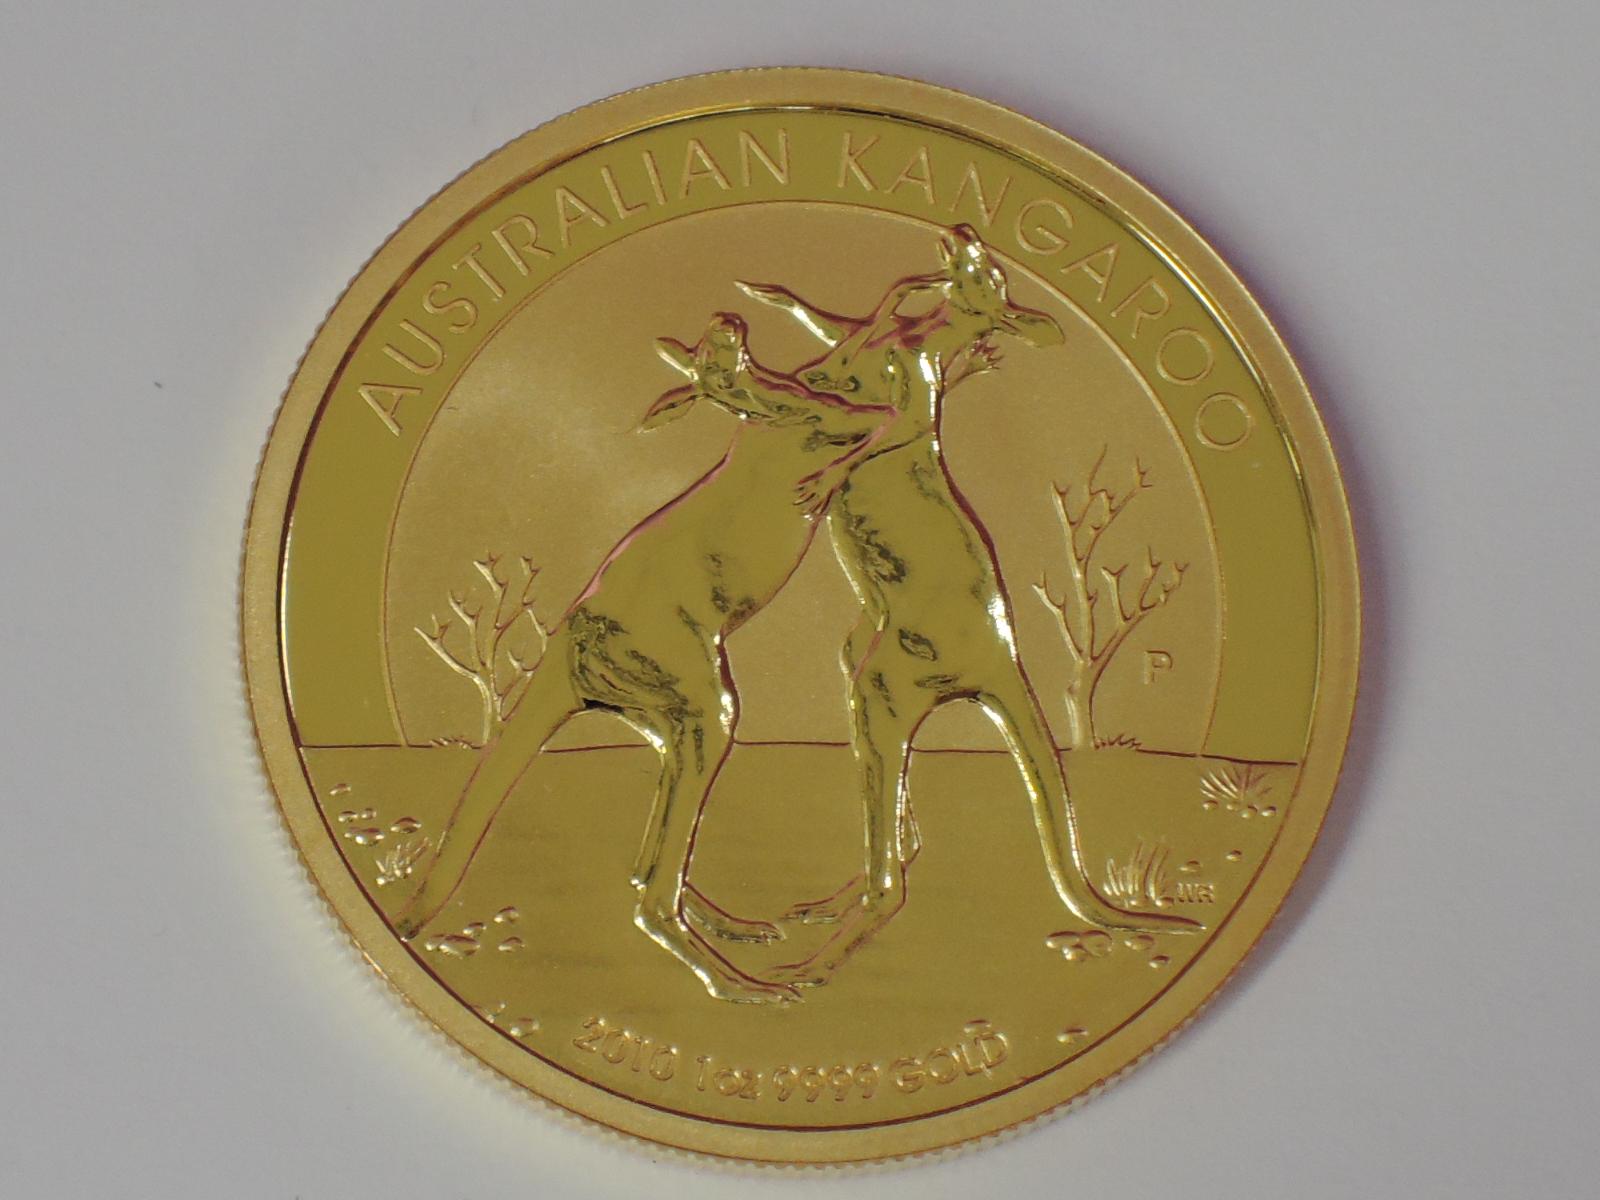 Lot 603 - A gold 1oz 2010 100 dollar Australian Kangaroo coin, in plastic case